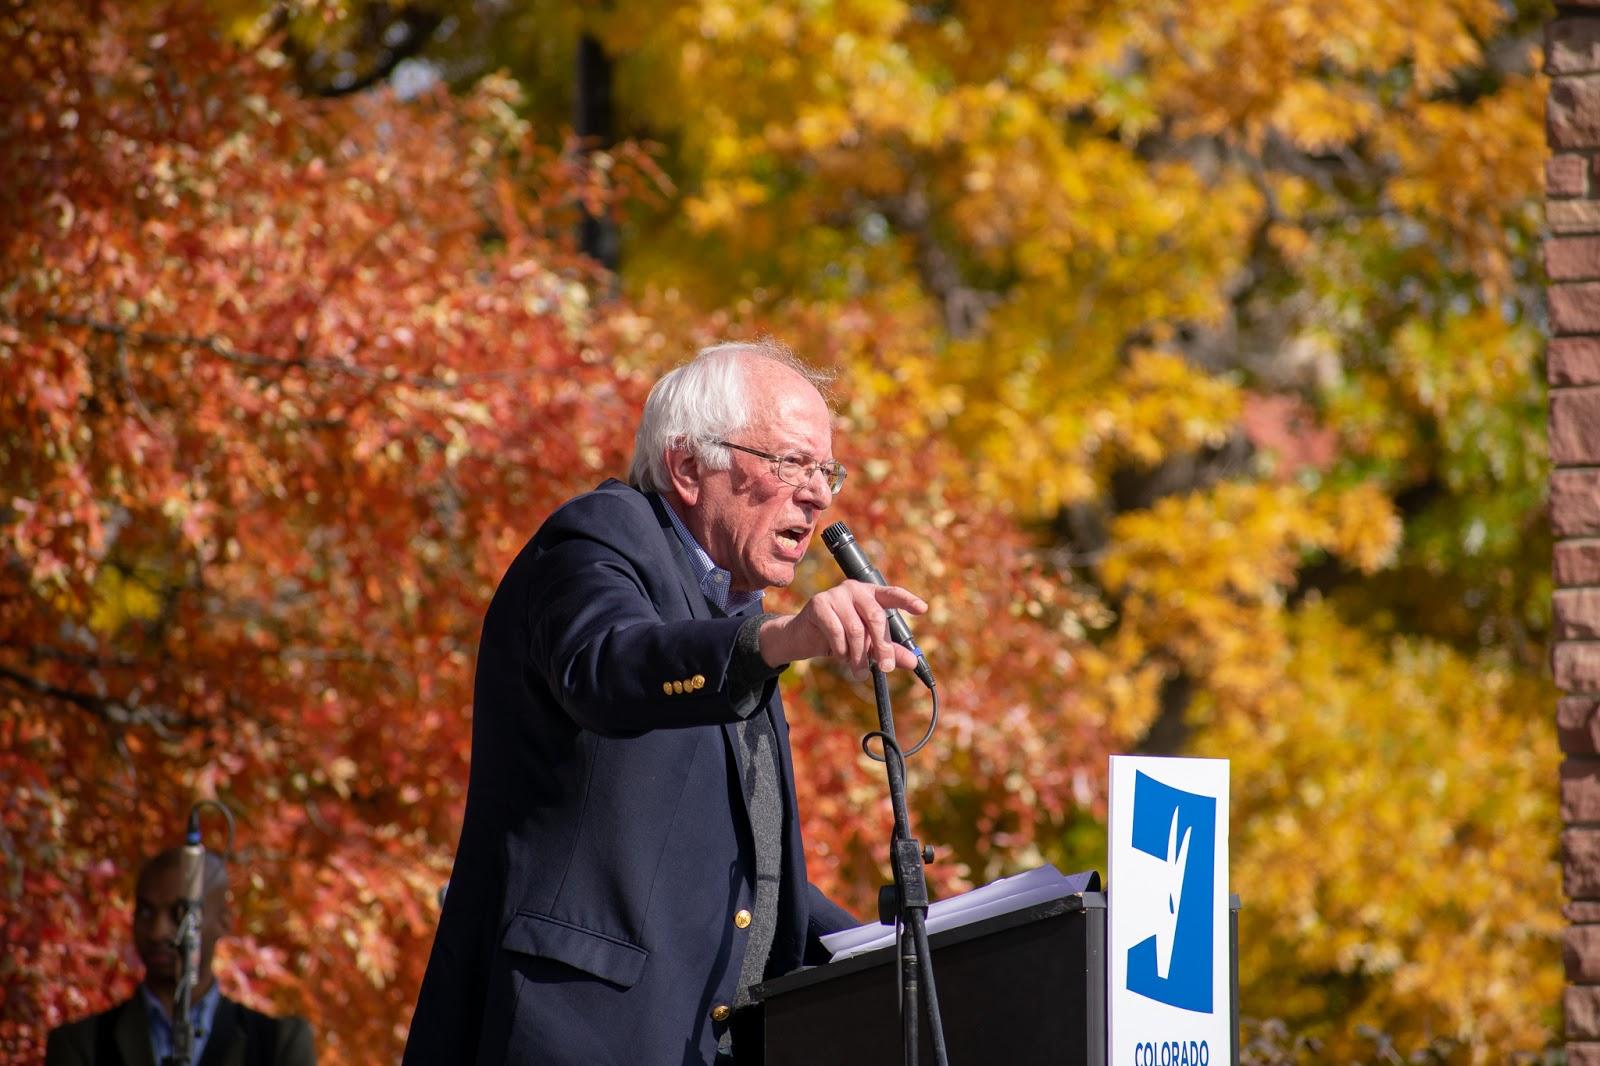 Bernie Sanders rallies on Farrand Field with Colorado Dem. candidates